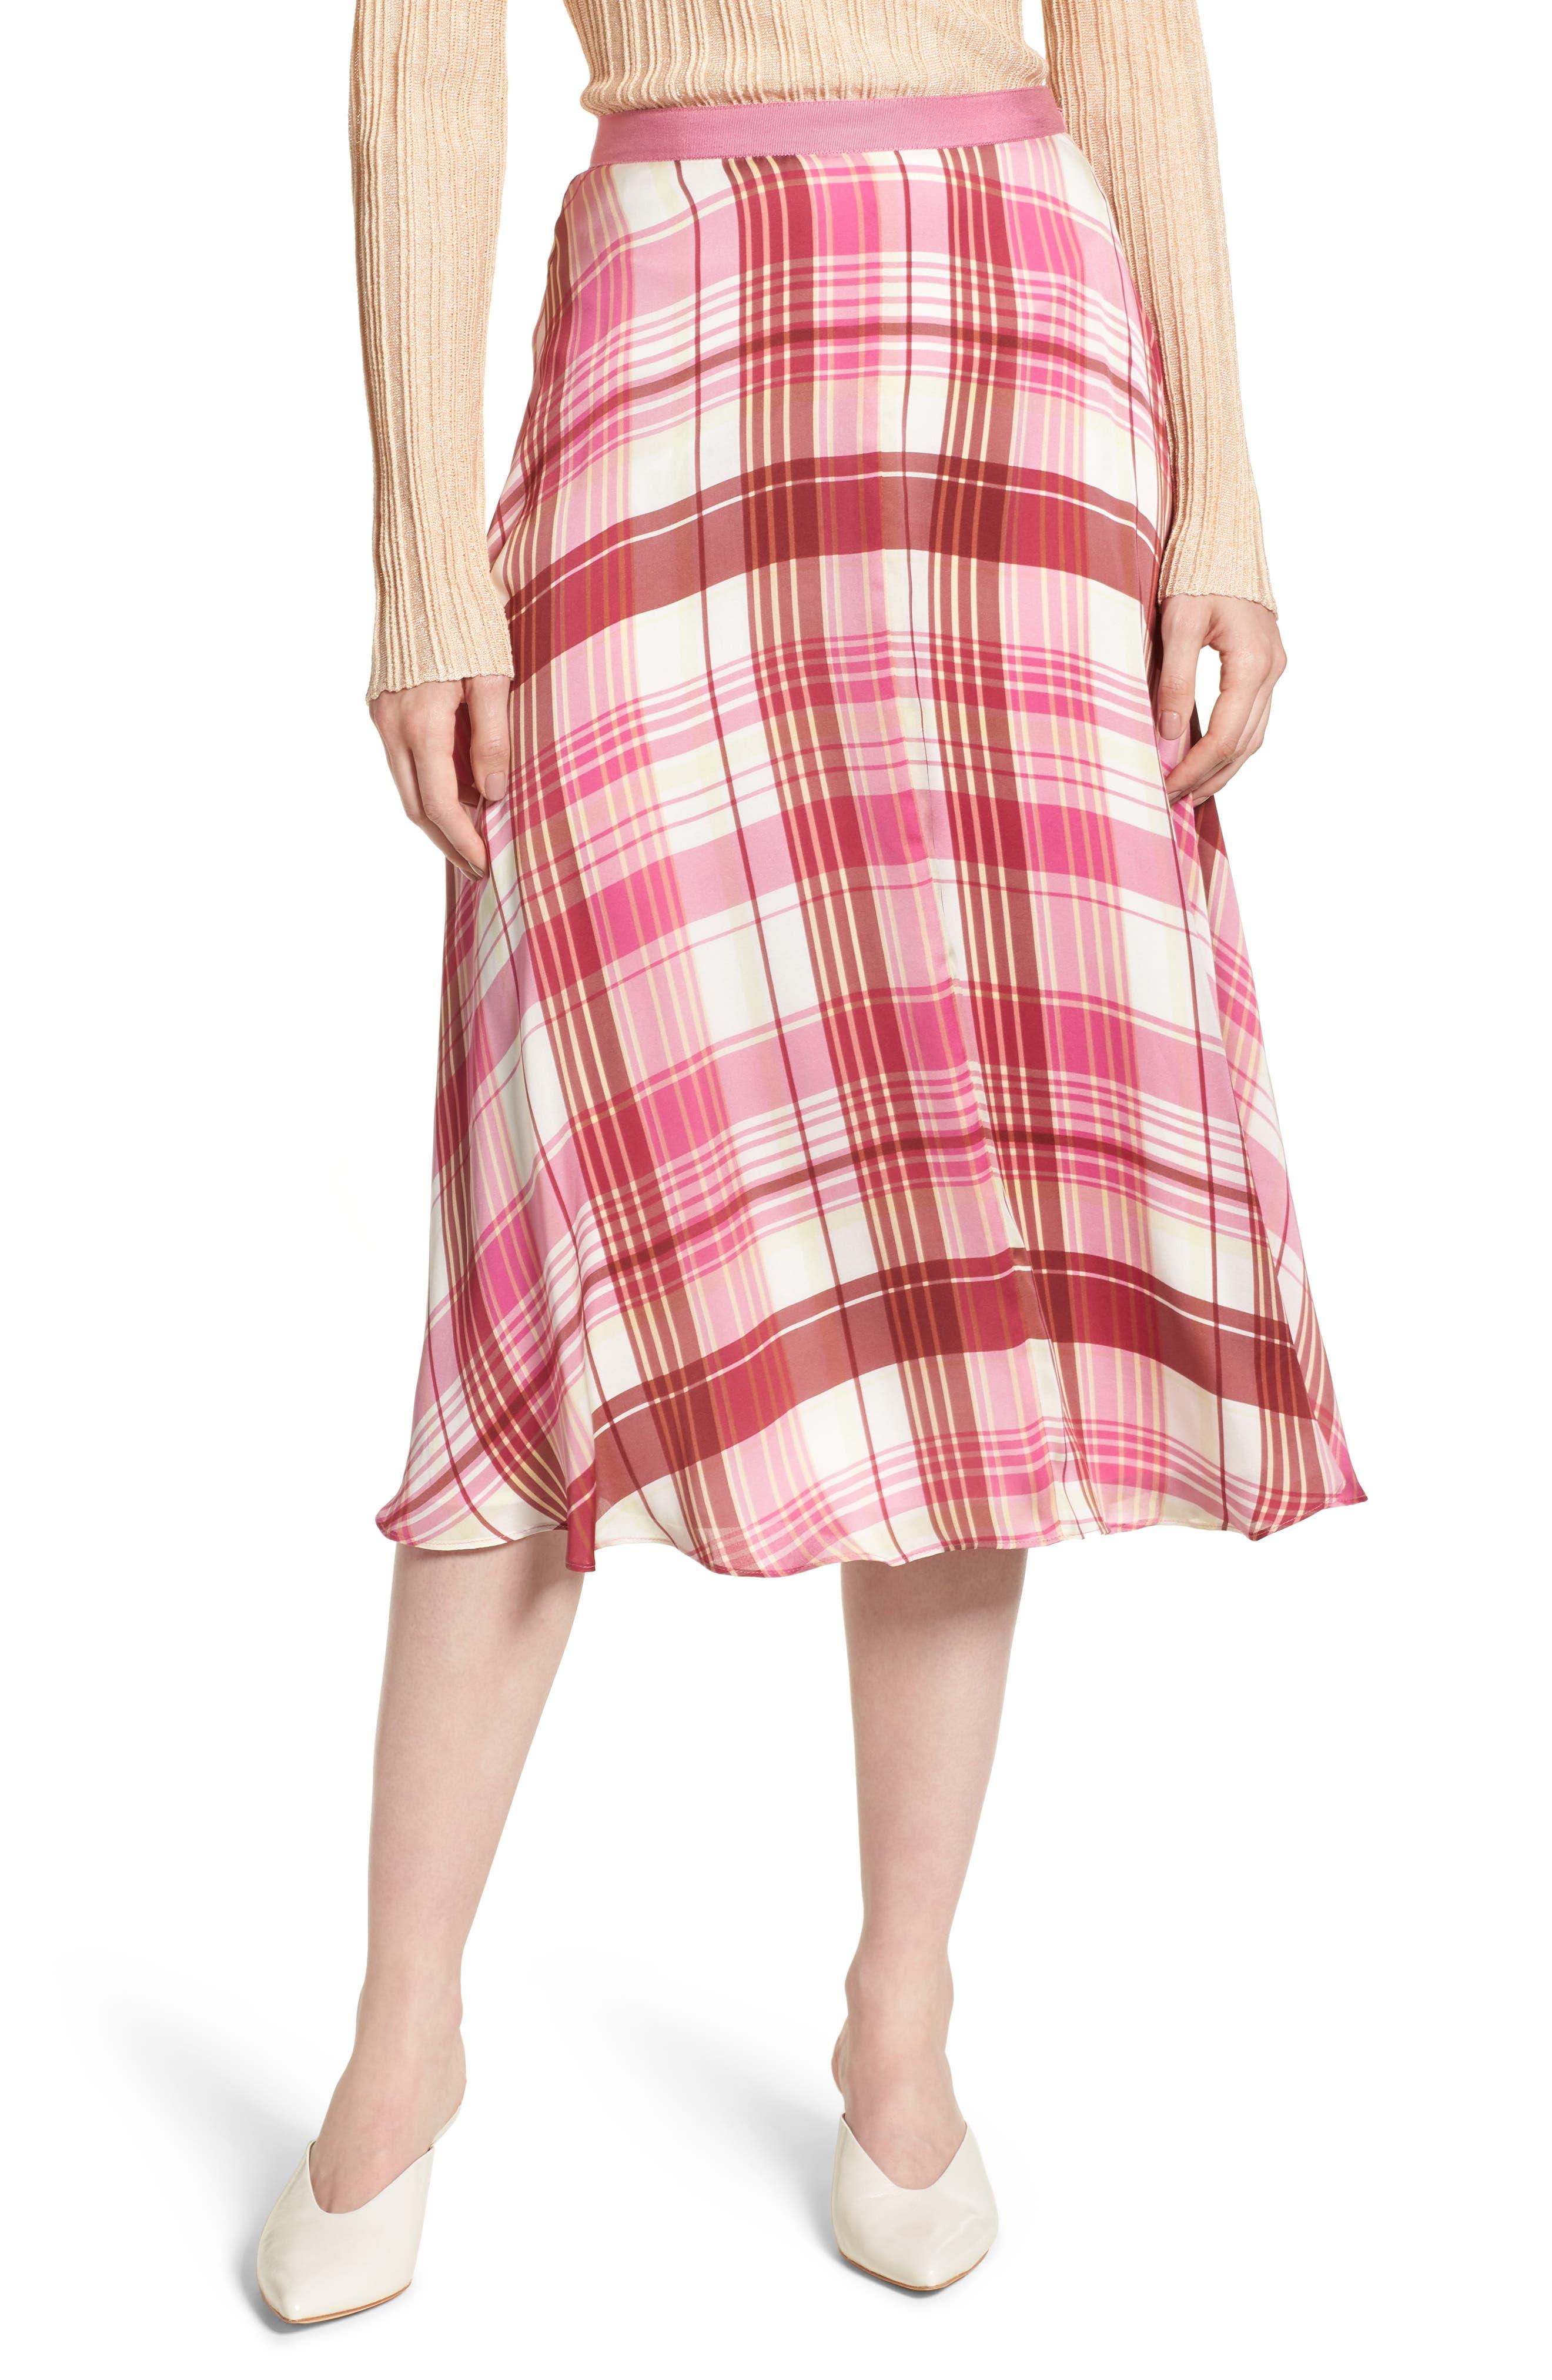 Plaid Silk Skirt,                             Main thumbnail 1, color,                             PINK PHLOX LARA PLAID